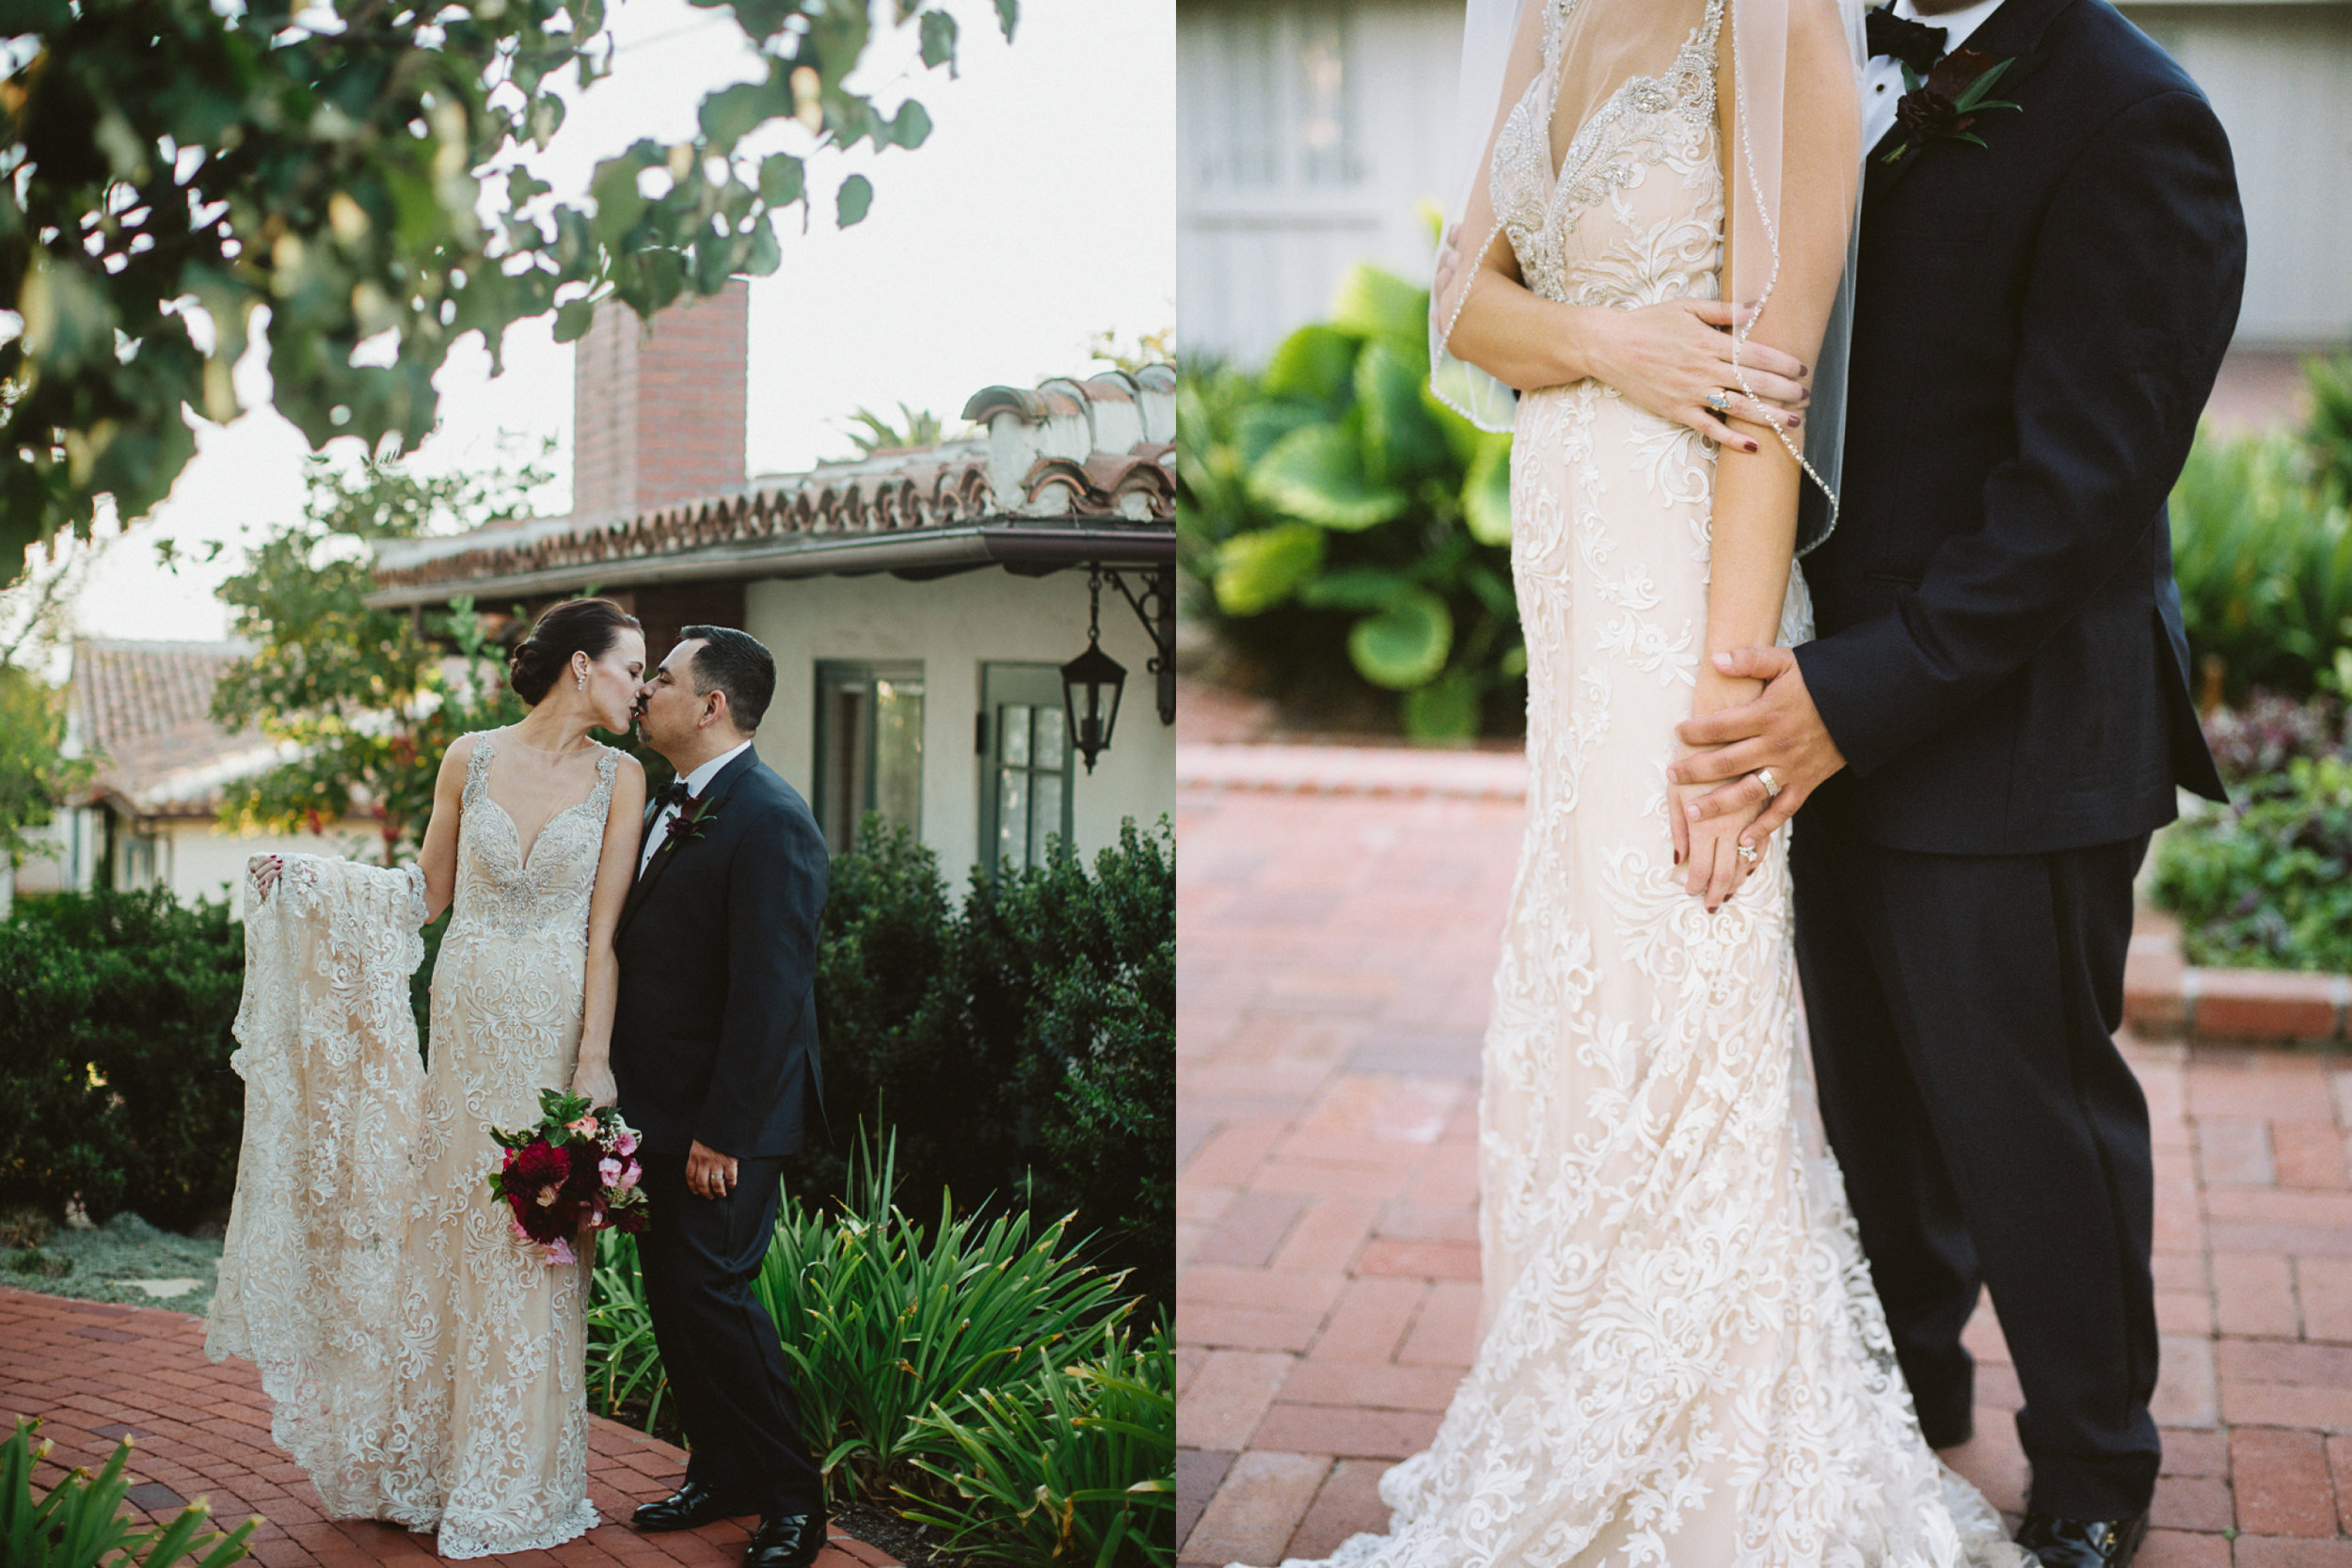 santa-barbara-elopement-elope-alegria-design-event-planner-coordinator-day-of-el-encanto-resort-lily-pond-wedding-intimate-red-maroon-city-ocean-view-rooftop (20).jpg